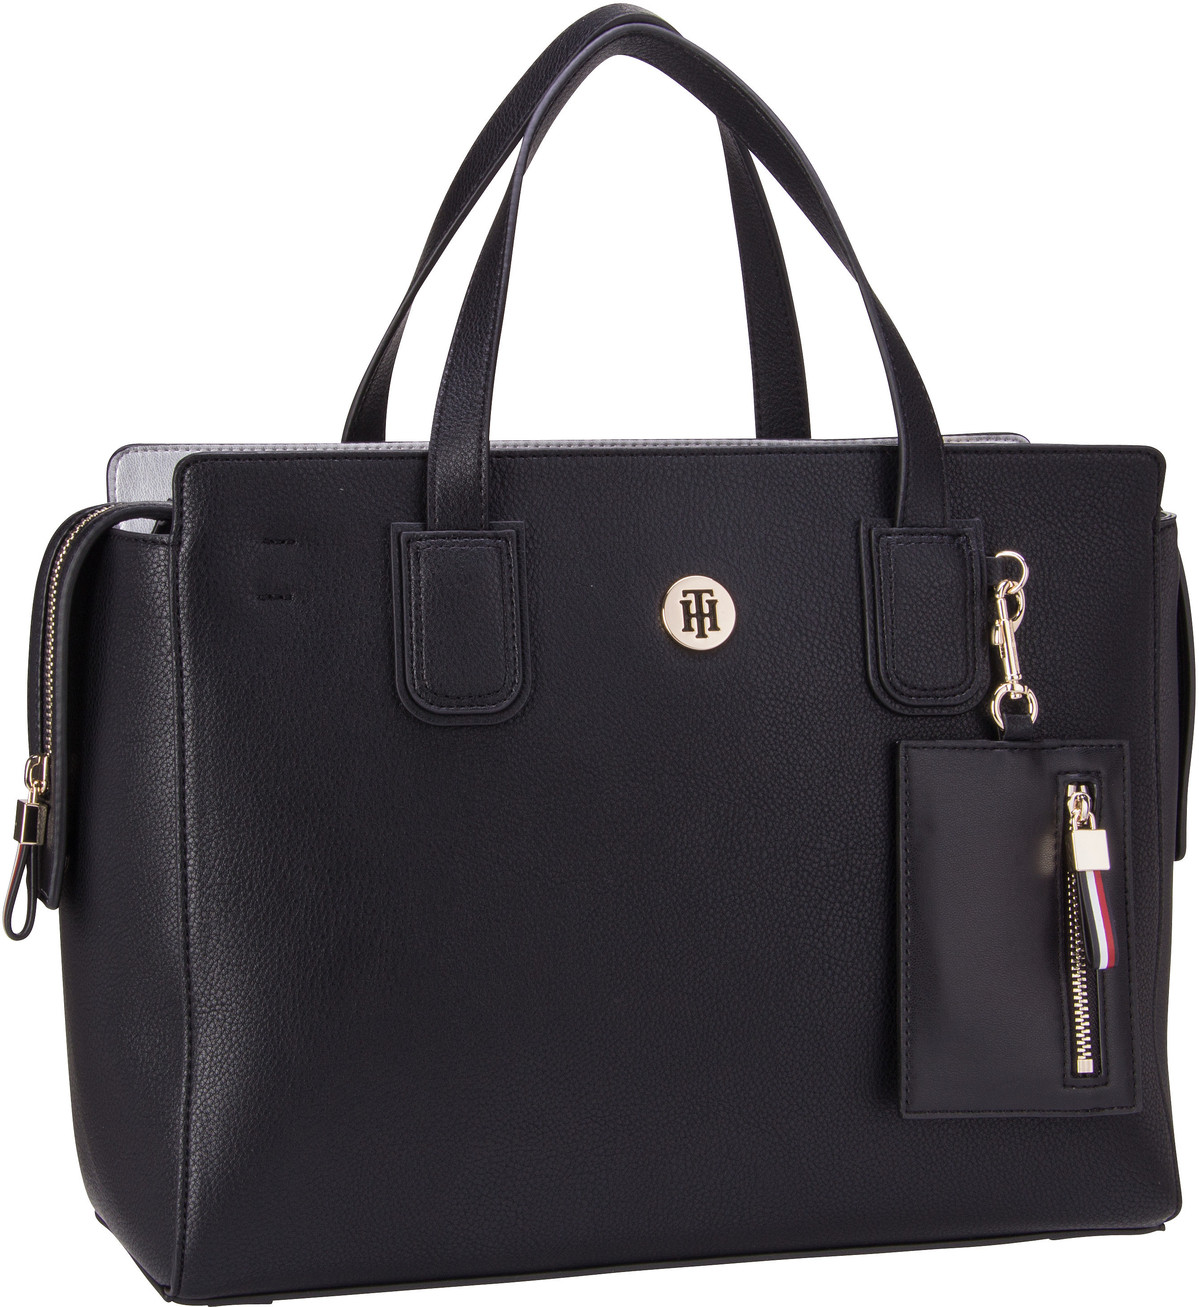 Handtasche Charming Tommy Satchel 7311 Black